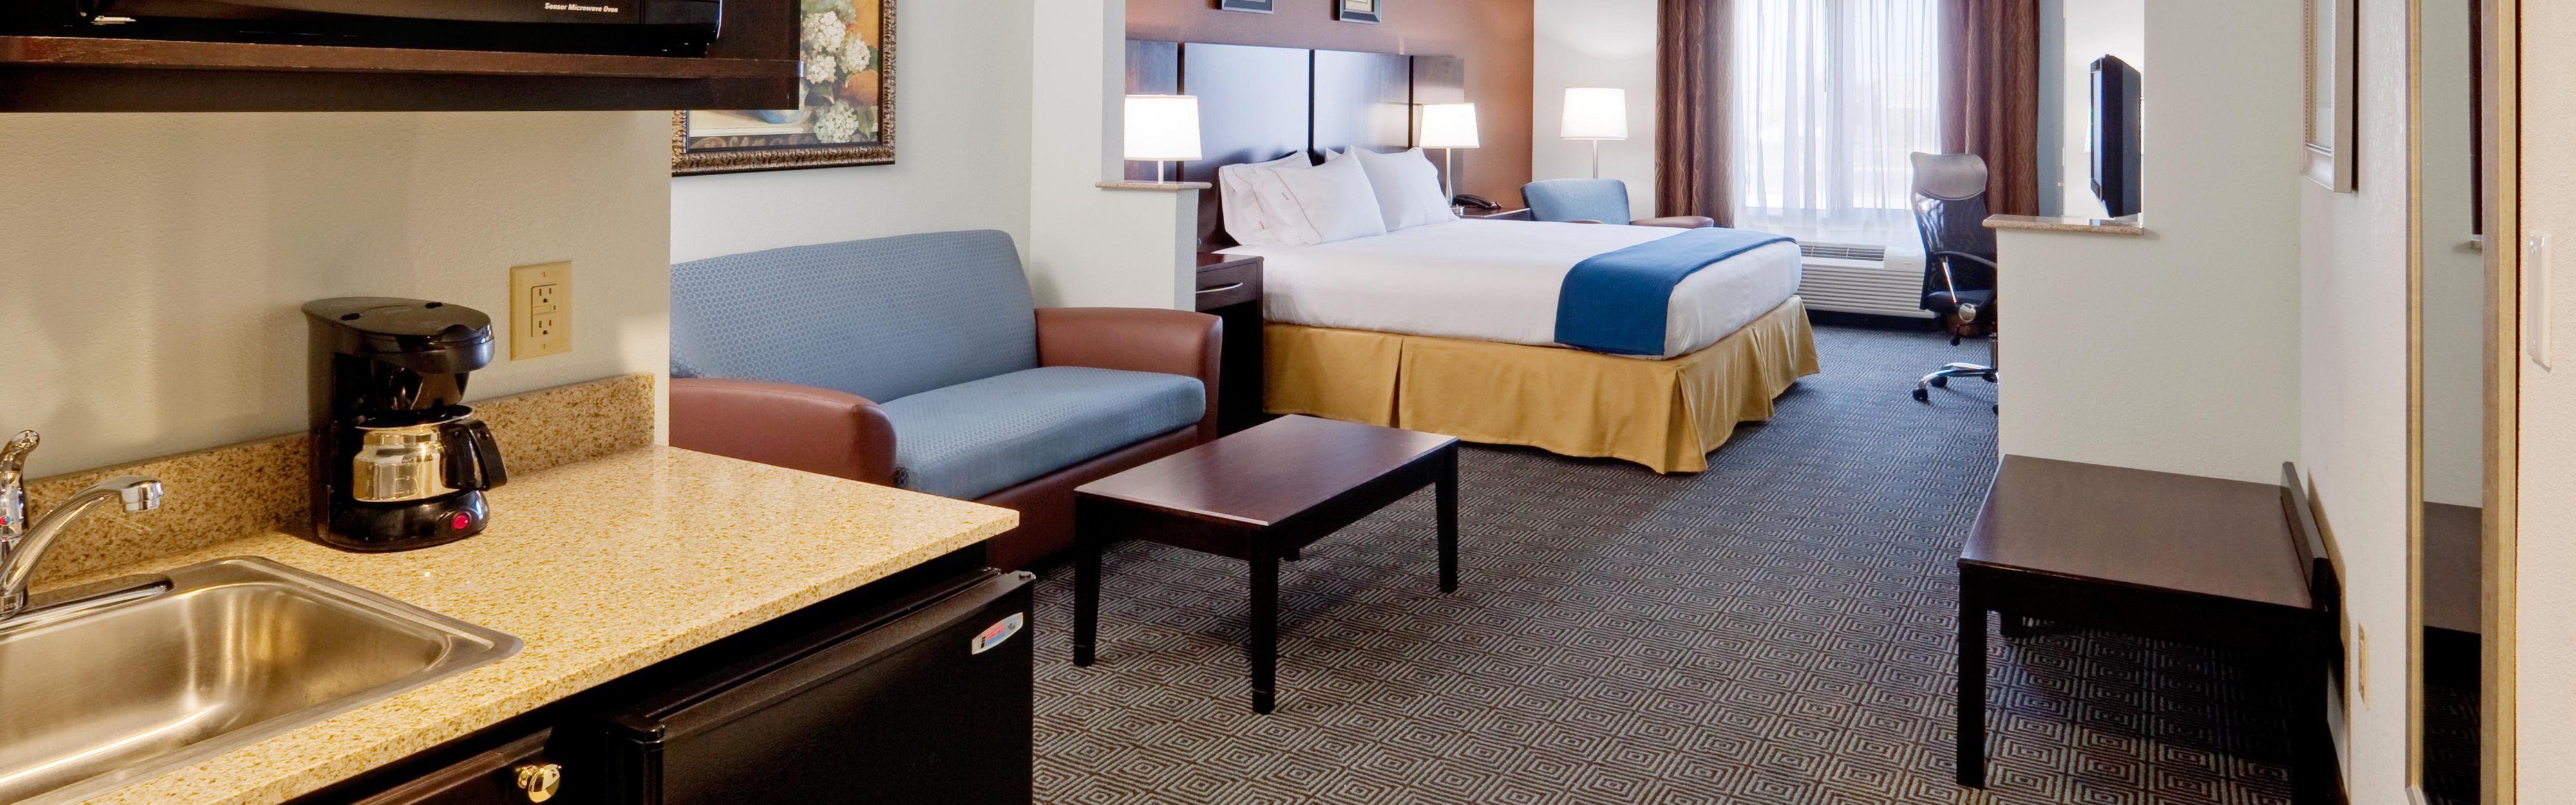 Doylestown Pa Hotels Motels